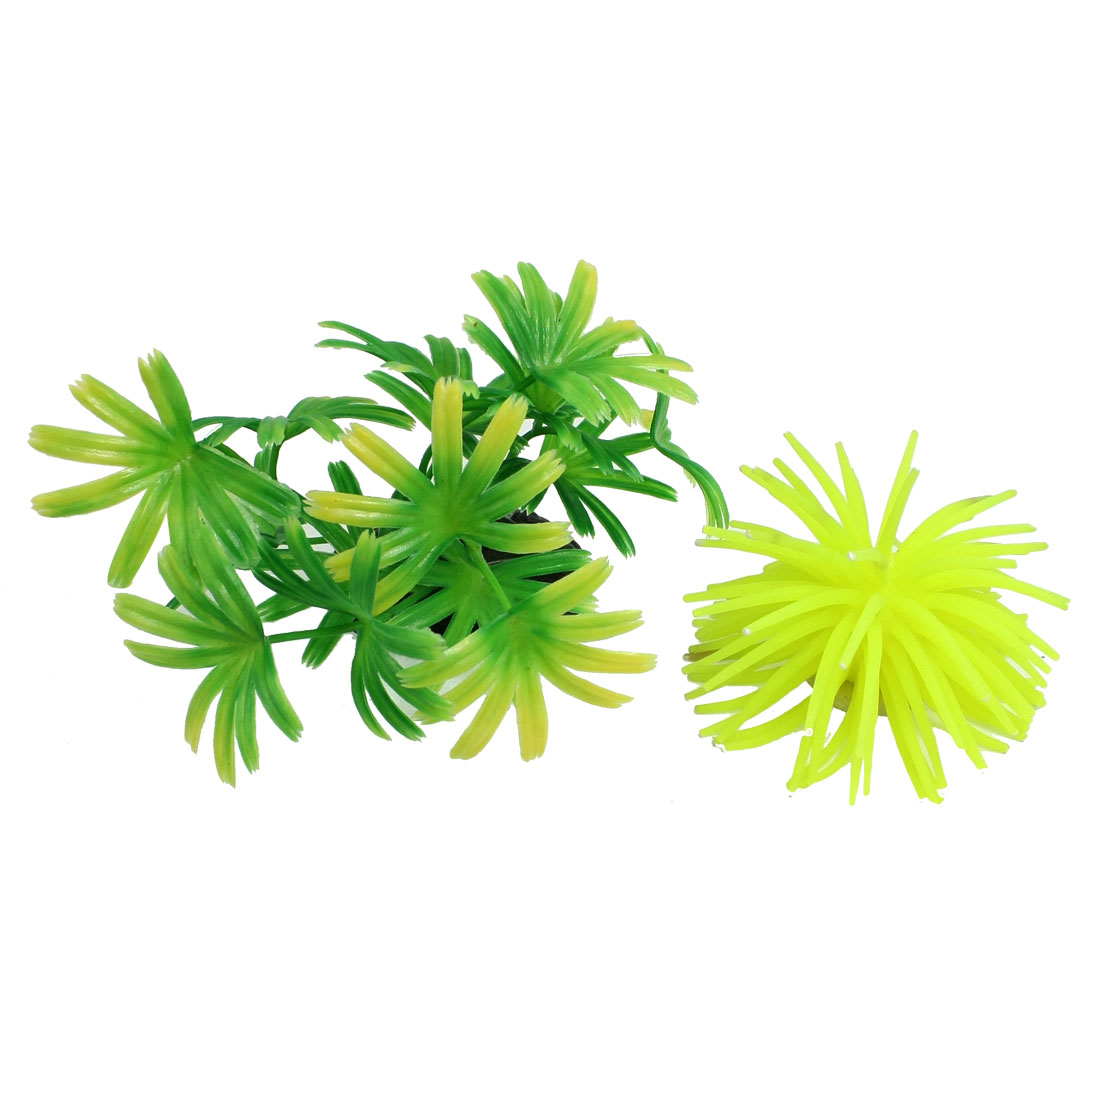 Aquarium Green Plastic Water Plants Yellowgreen Silicone Coral Fish Tank Decor 2 in 1